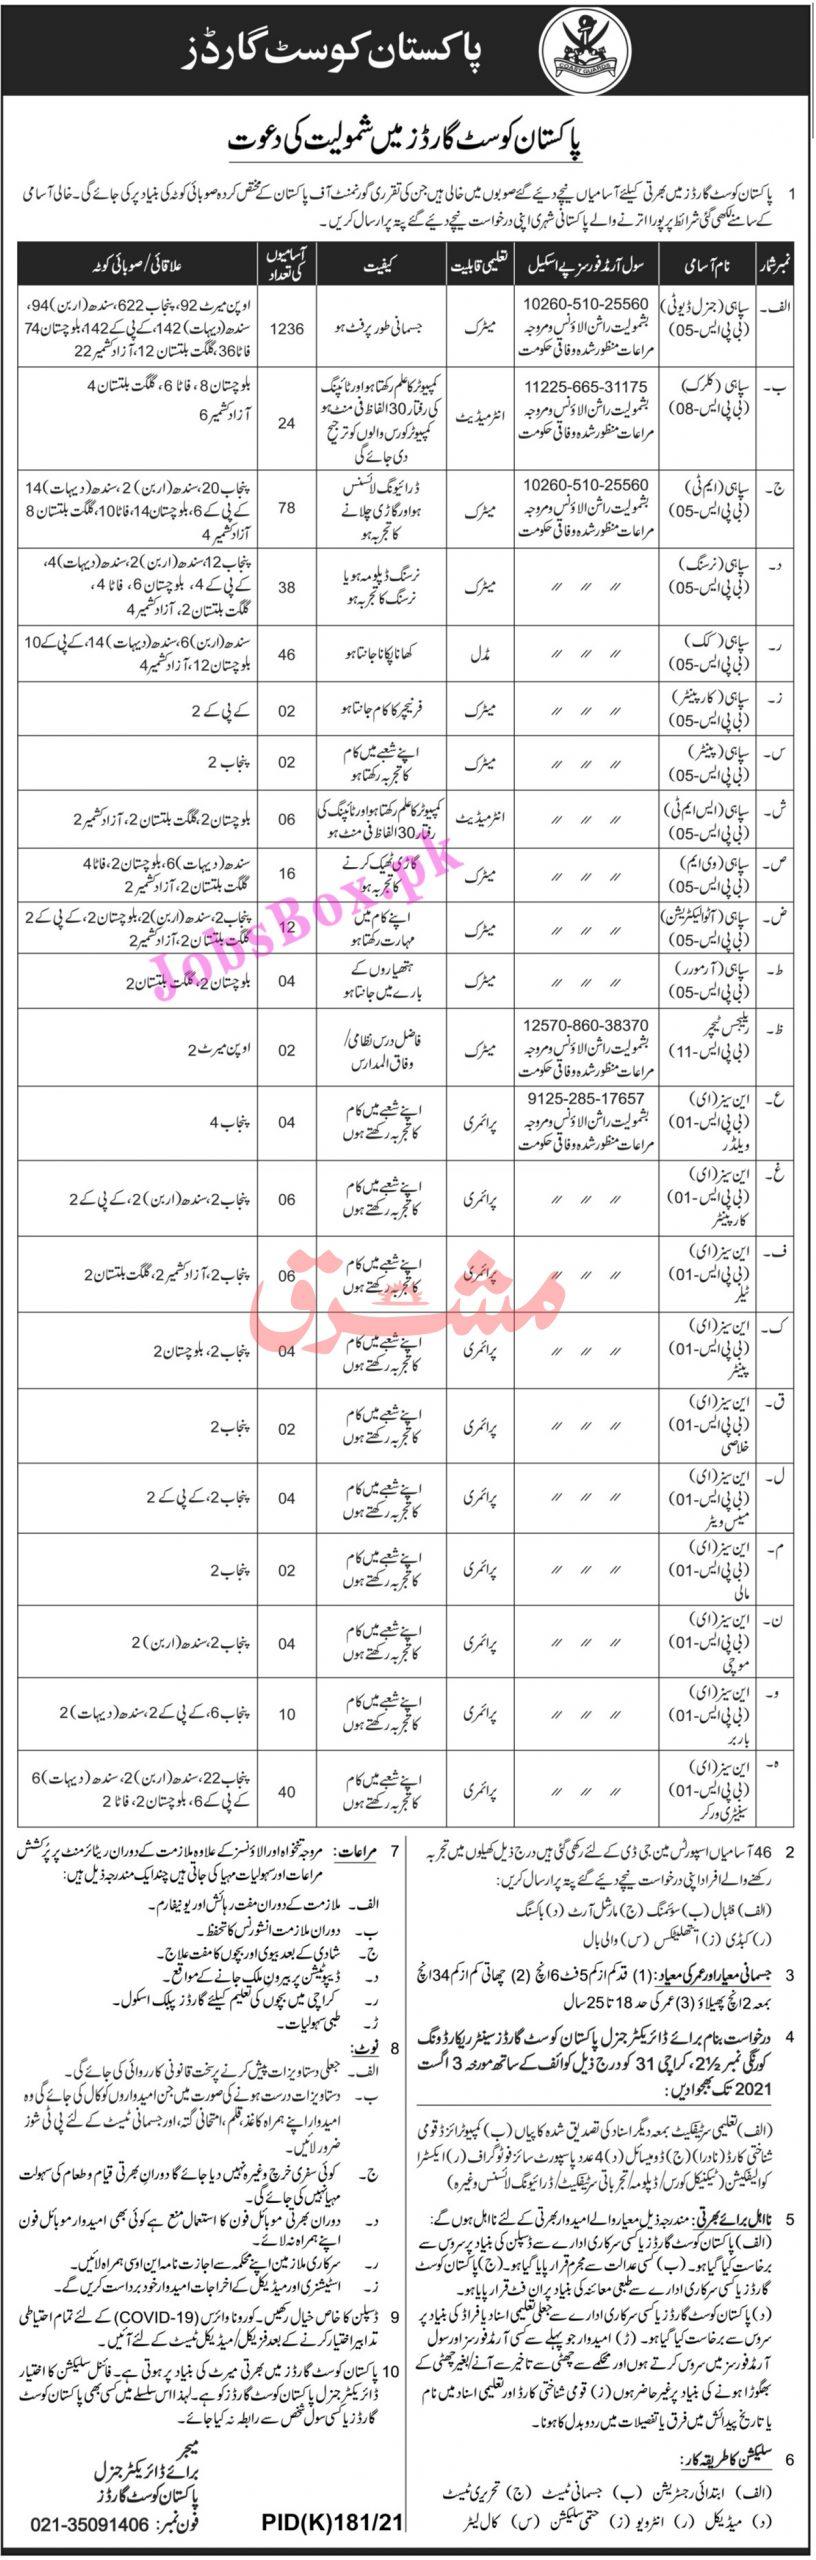 Pakistan Coast Guards Jobs 2021 - Download Application Form